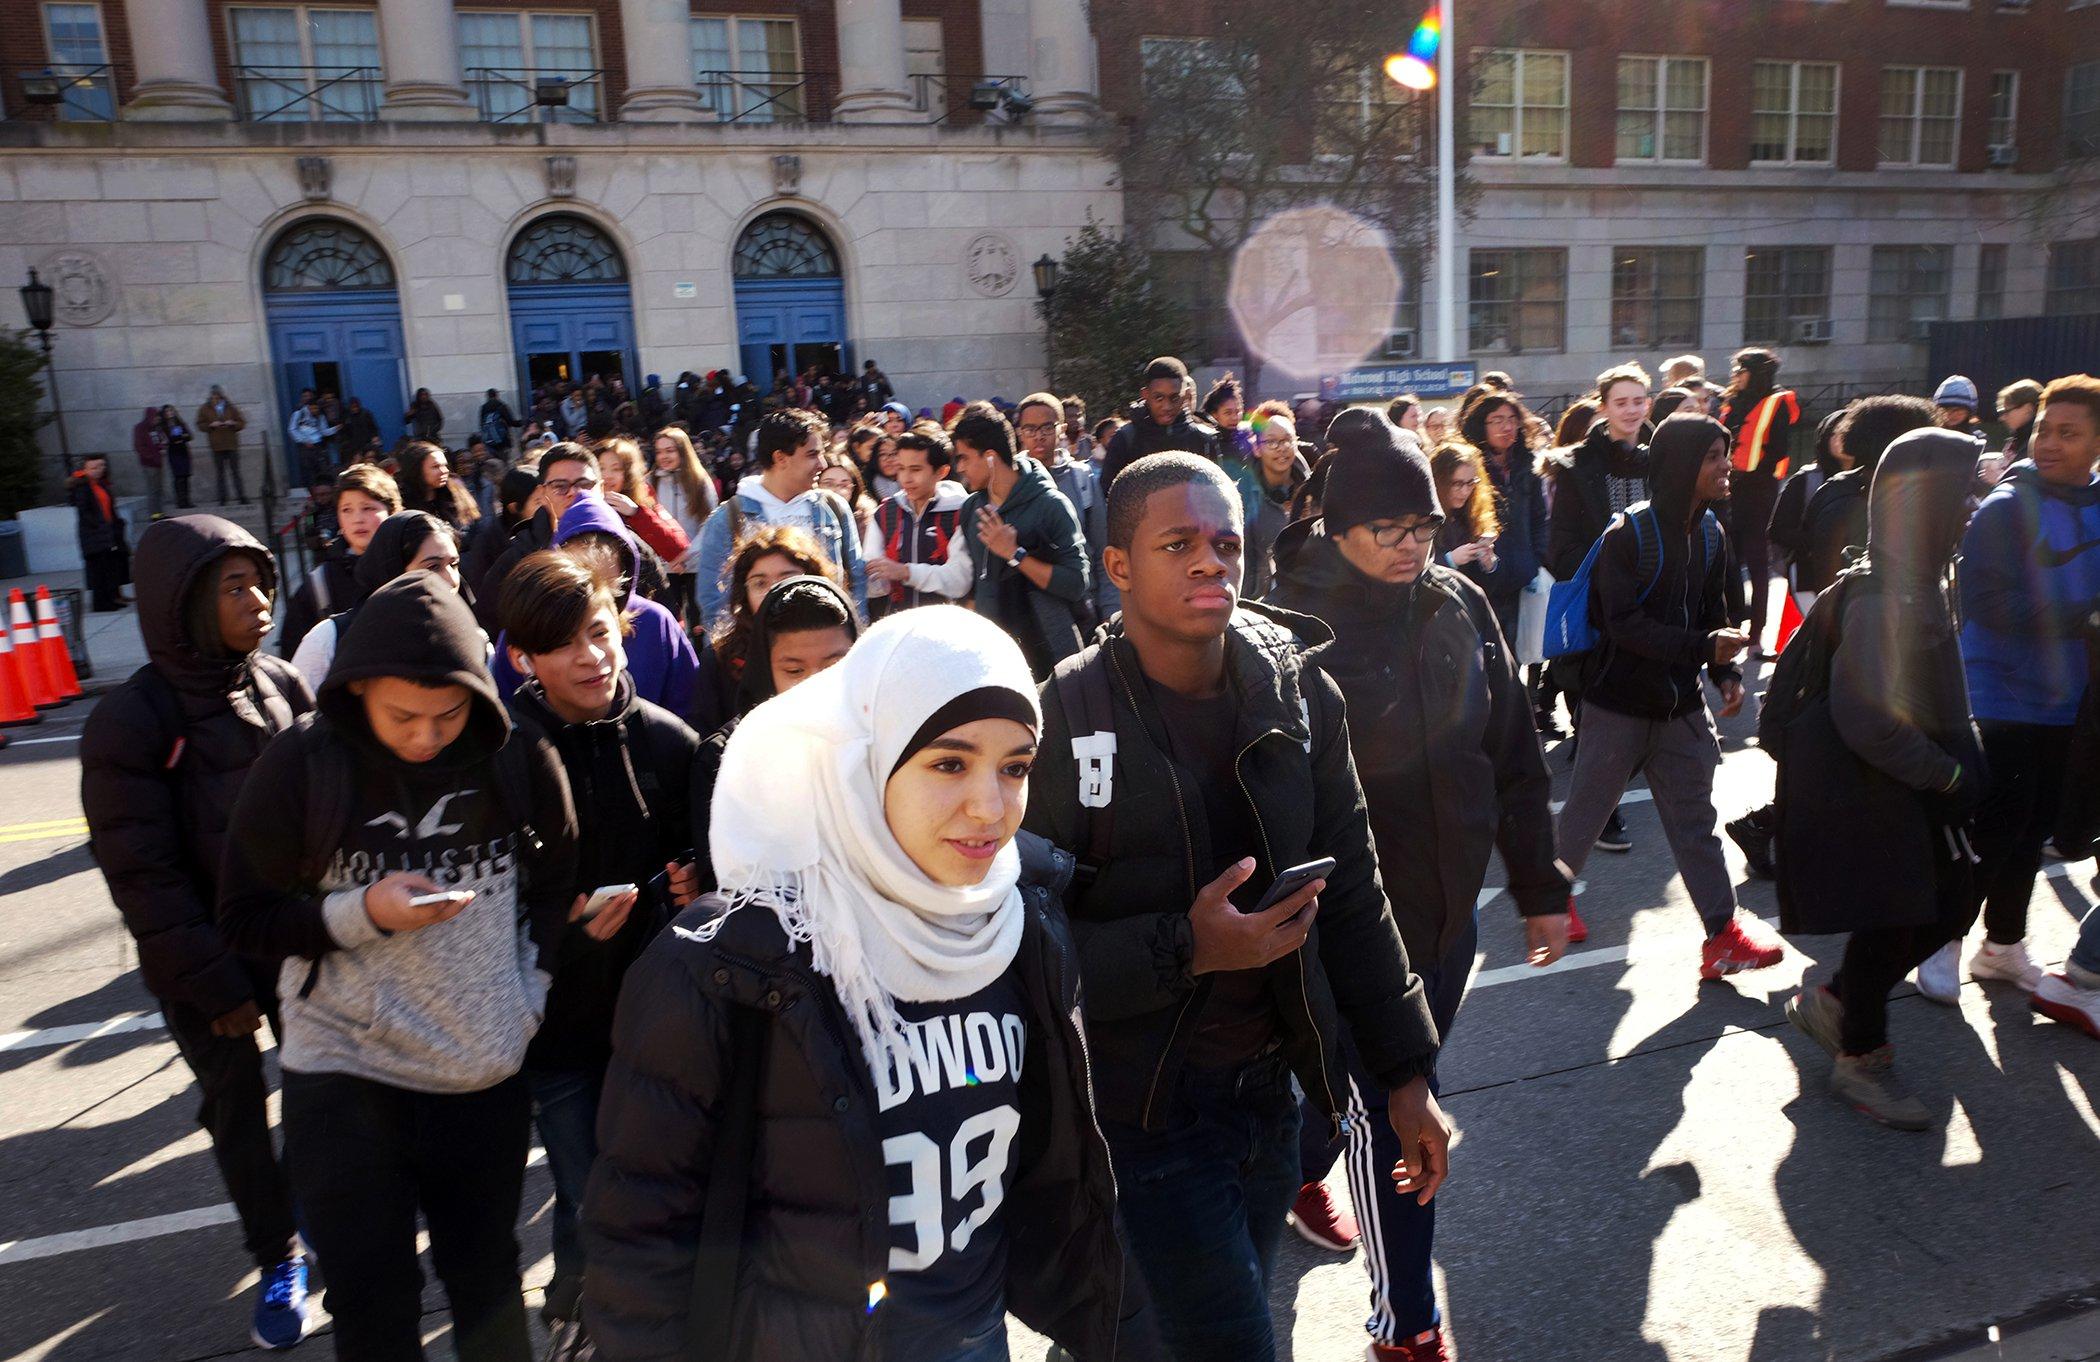 Students-Gun-Violence-Walkout-New-York.jpg